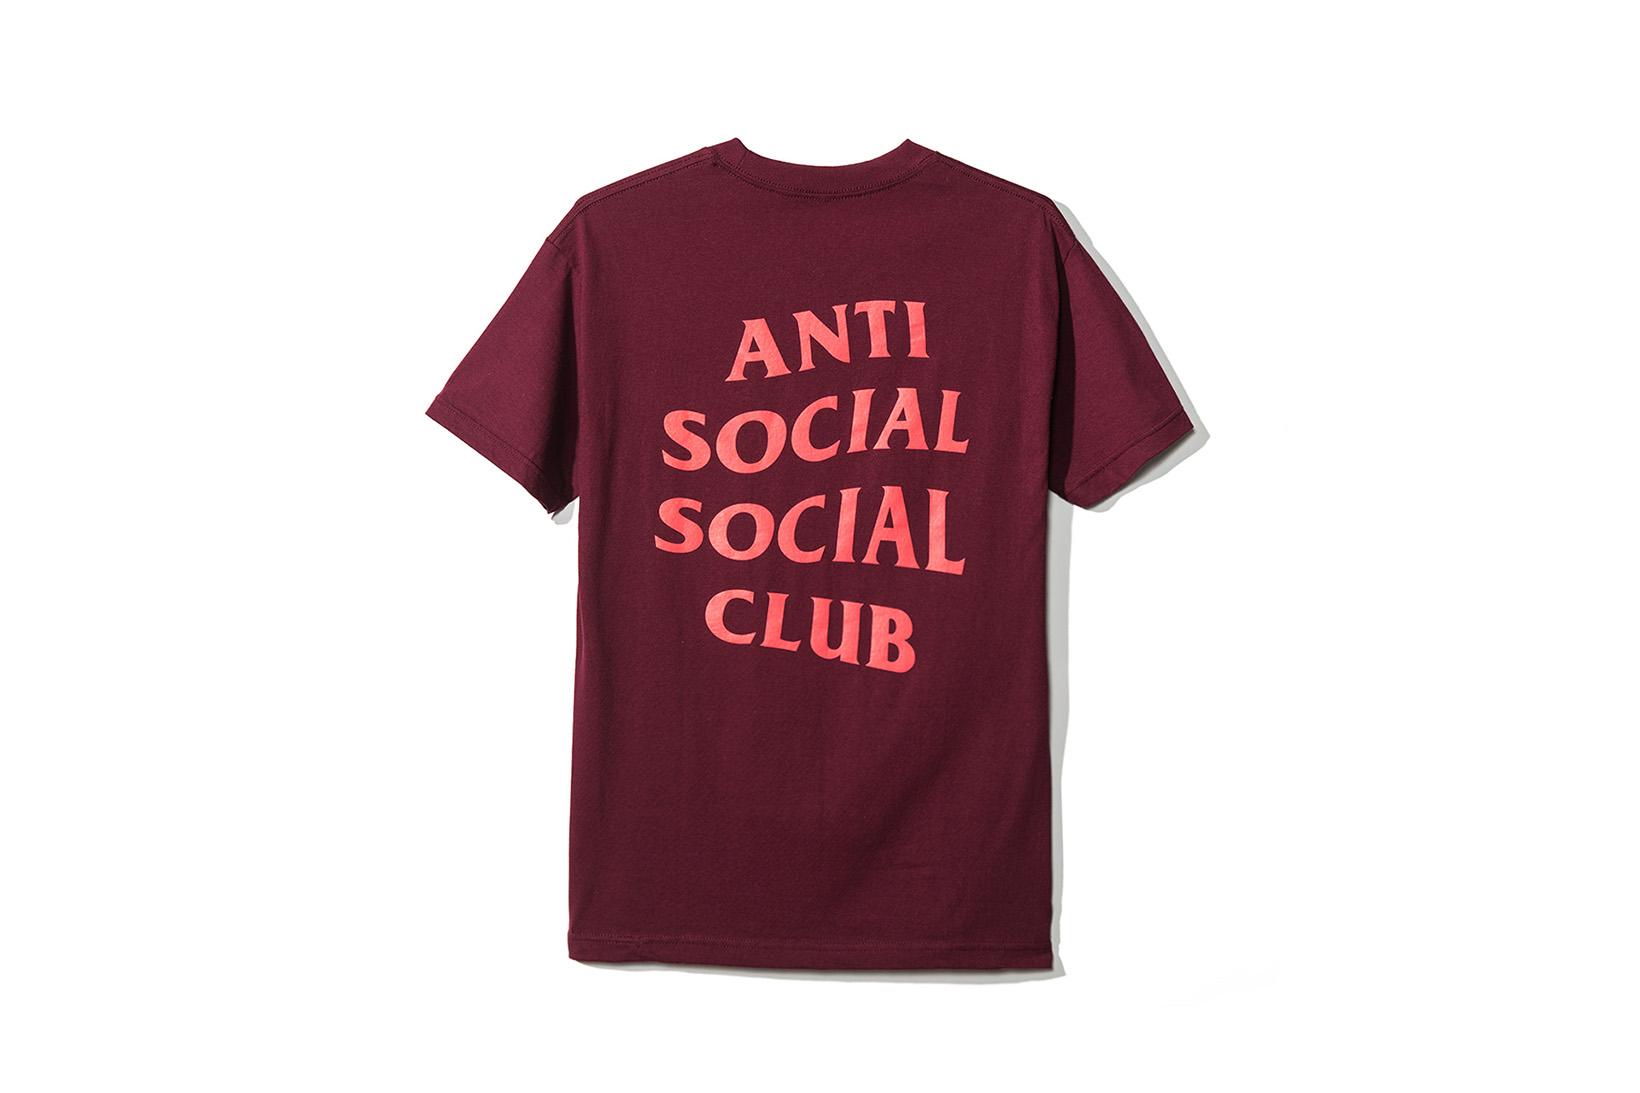 Anti Social Social Club 2017 Spring Summer - 3744352